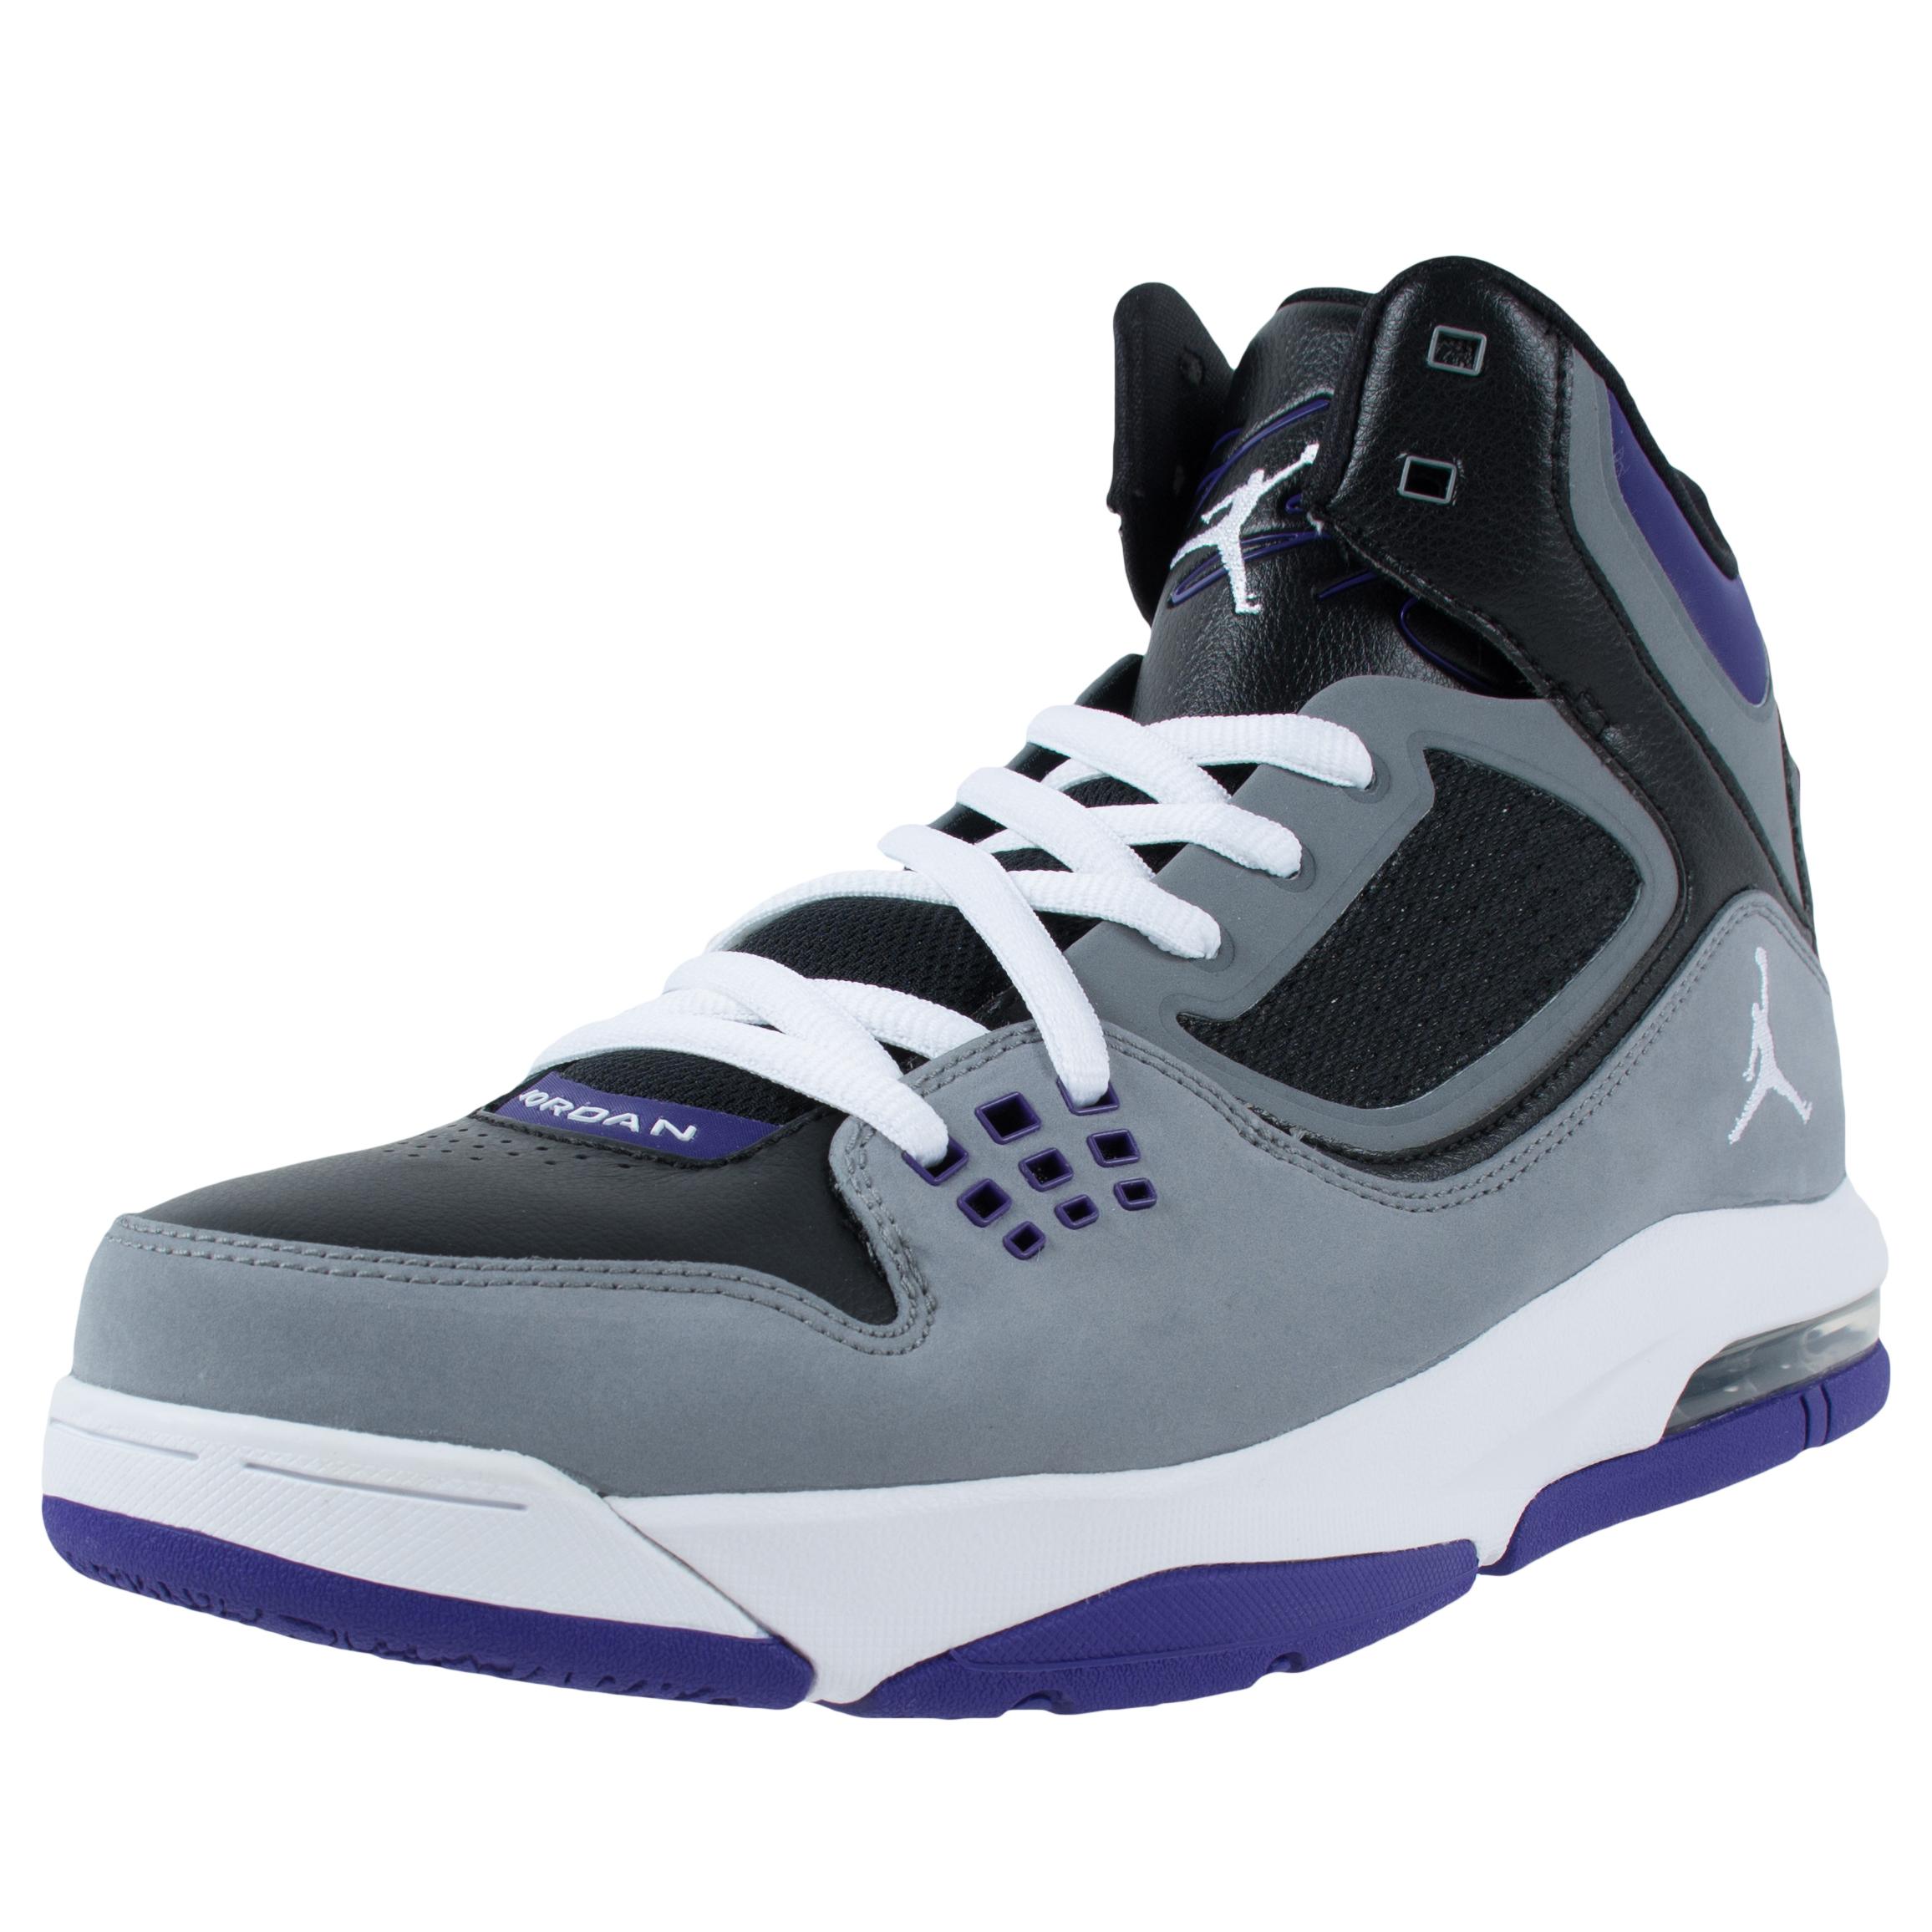 best sneakers e89d1 76983 mens jordan flight 23 purple